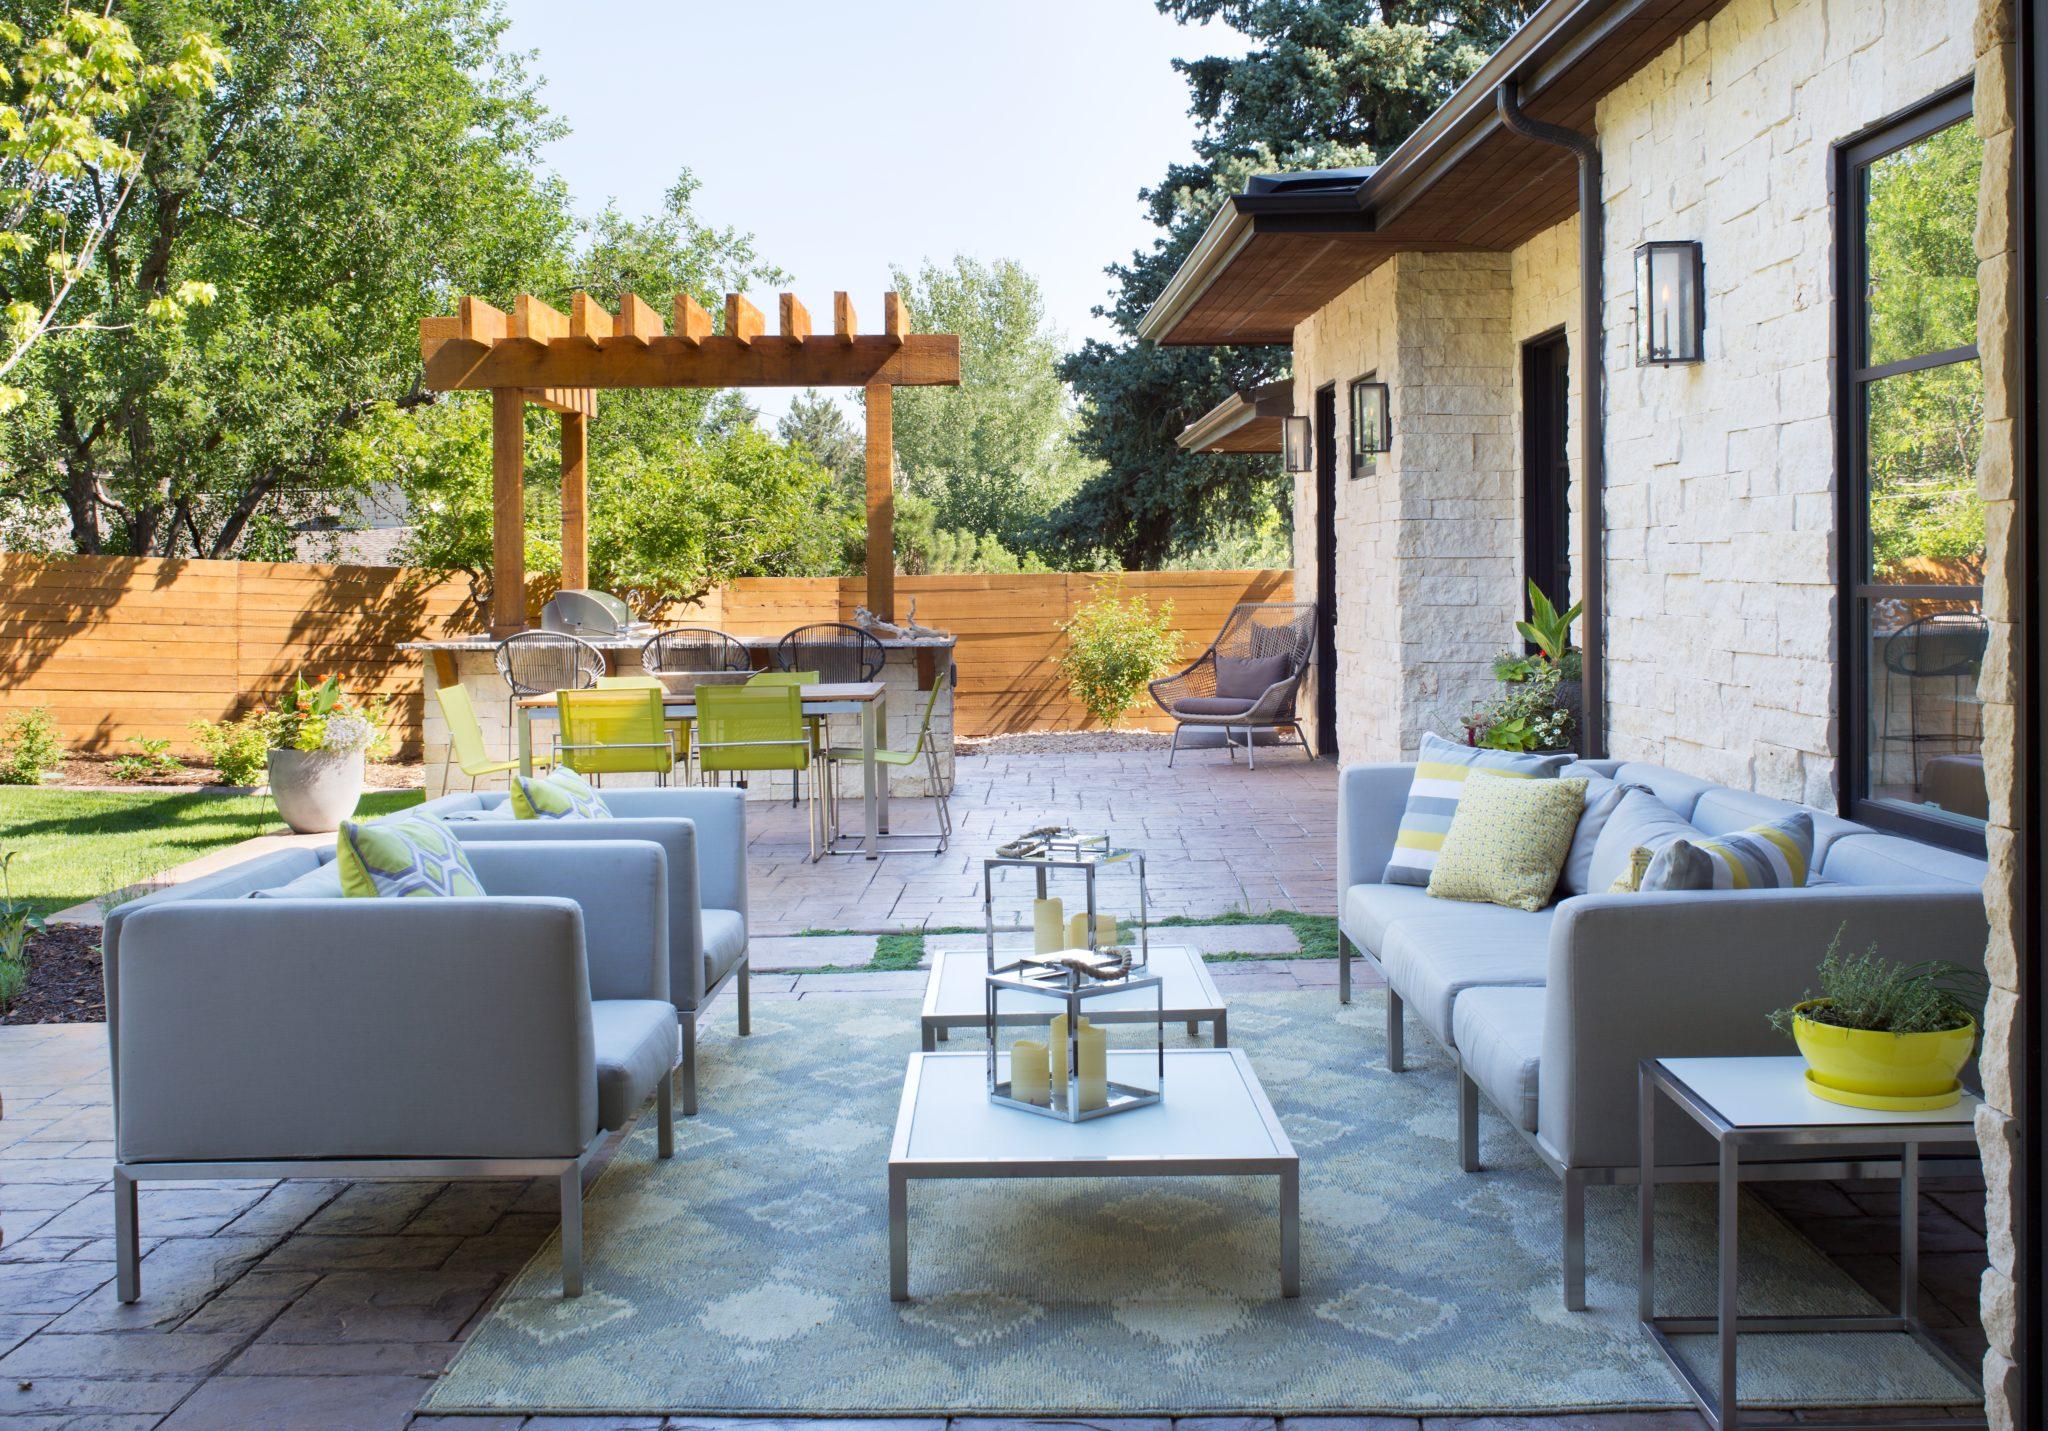 A property in Denver, Colorado, featuring interior design by Slifer Designs